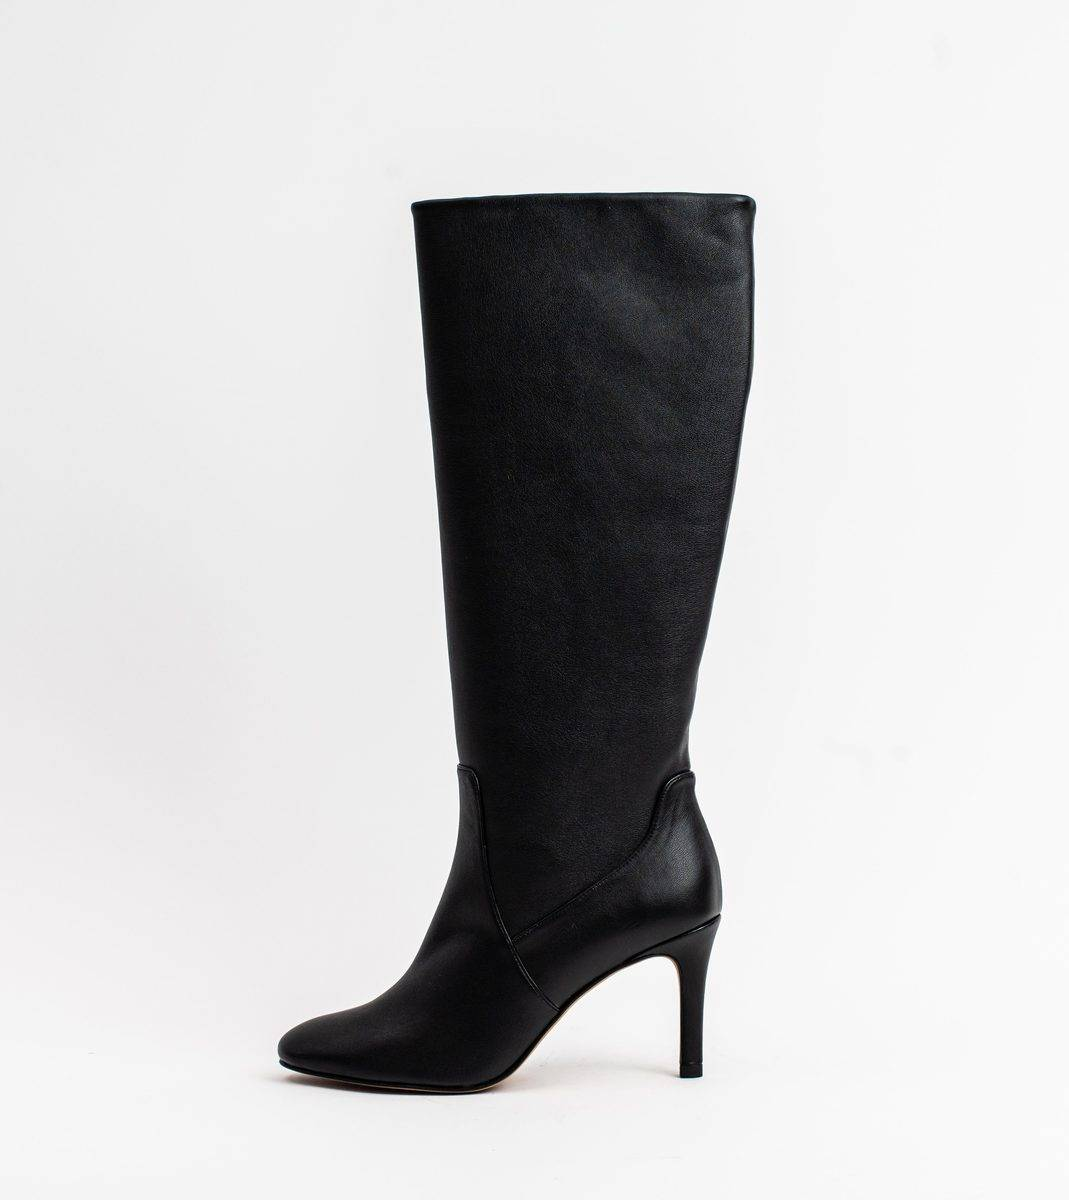 Allkind Chloe Black Vegan Leather Heeled Long Boot